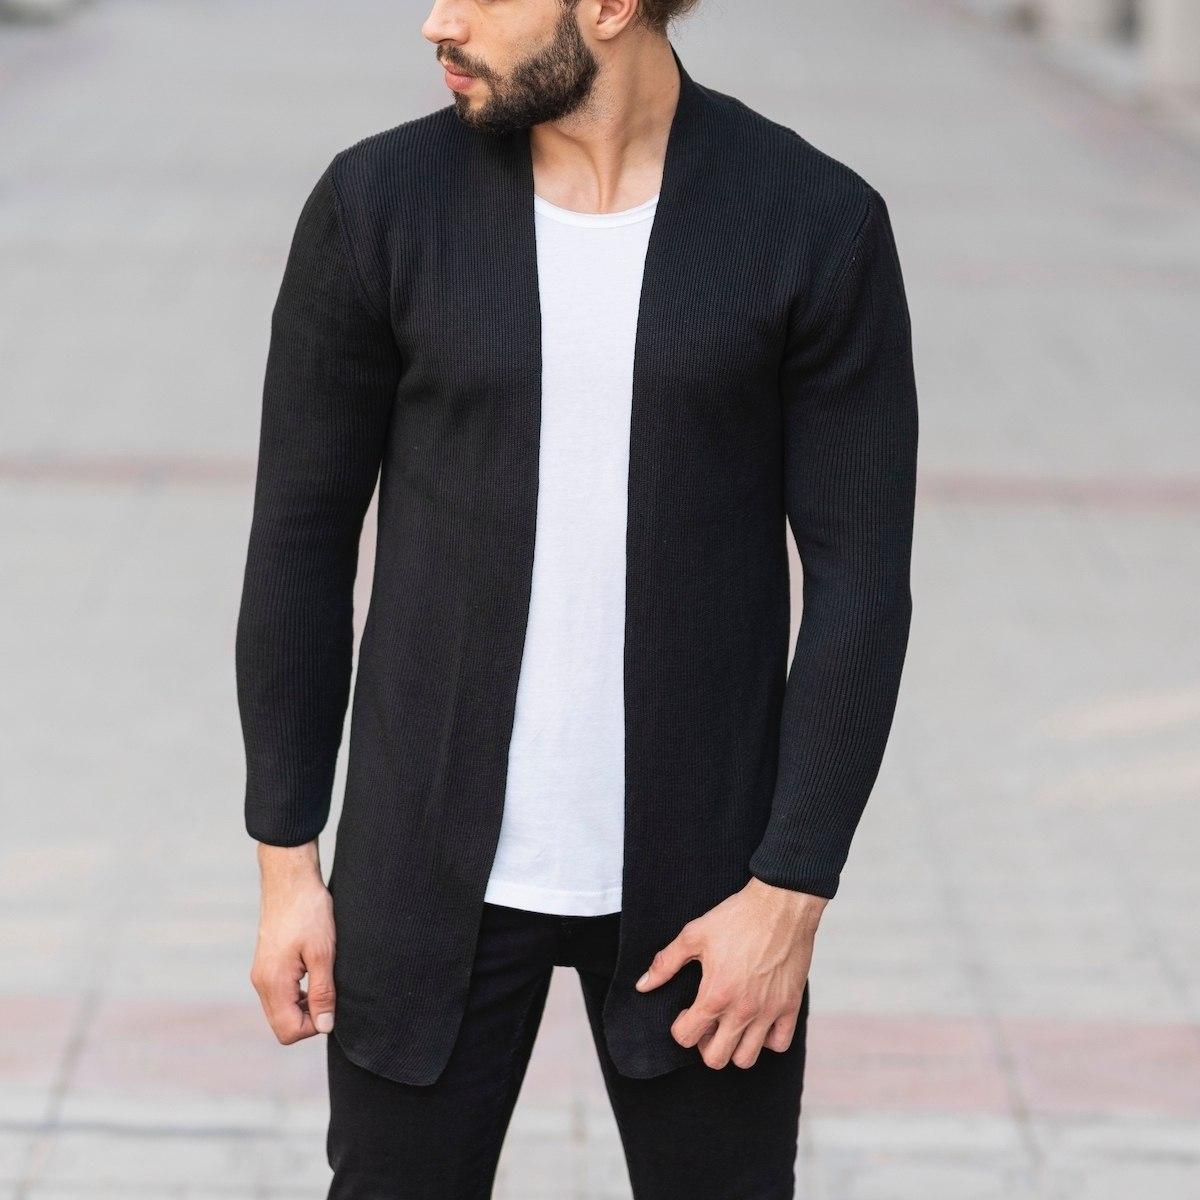 Tricot Style Black Cardigan